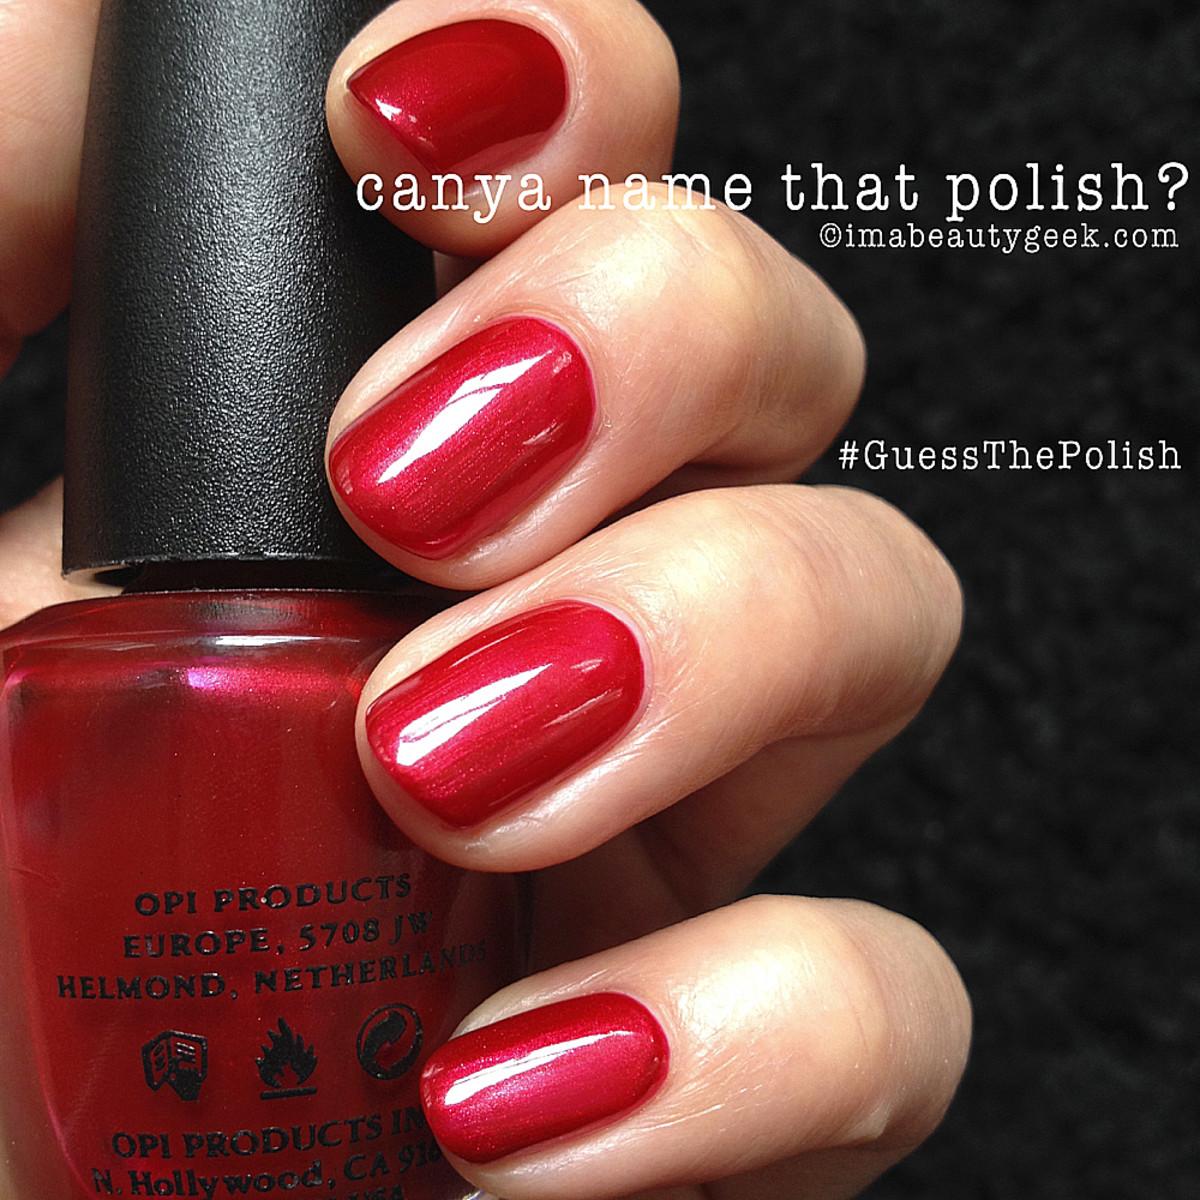 Guess the Polish 6_Beautygeeks